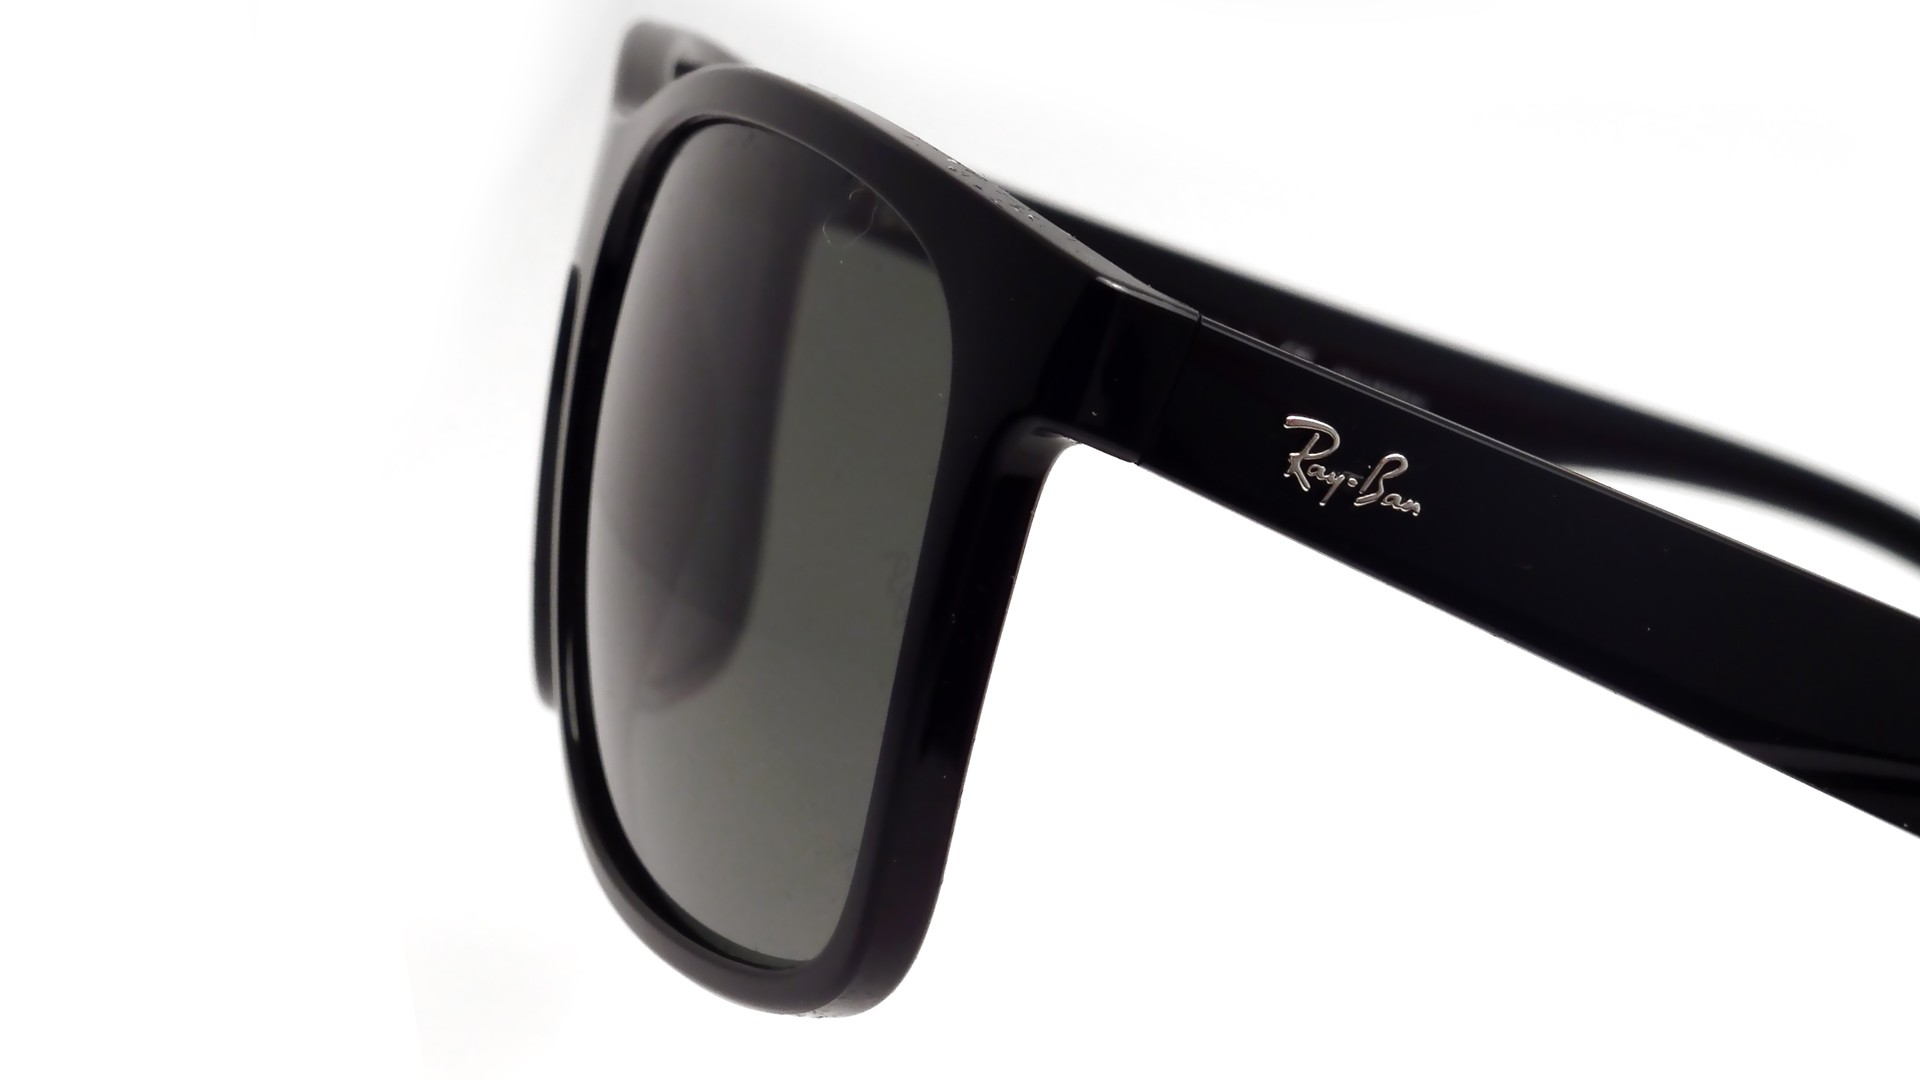 707718b36645 Sunglasses Ray-Ban Highstreet Black RB4232 601/9A 57-17 Large Polarized